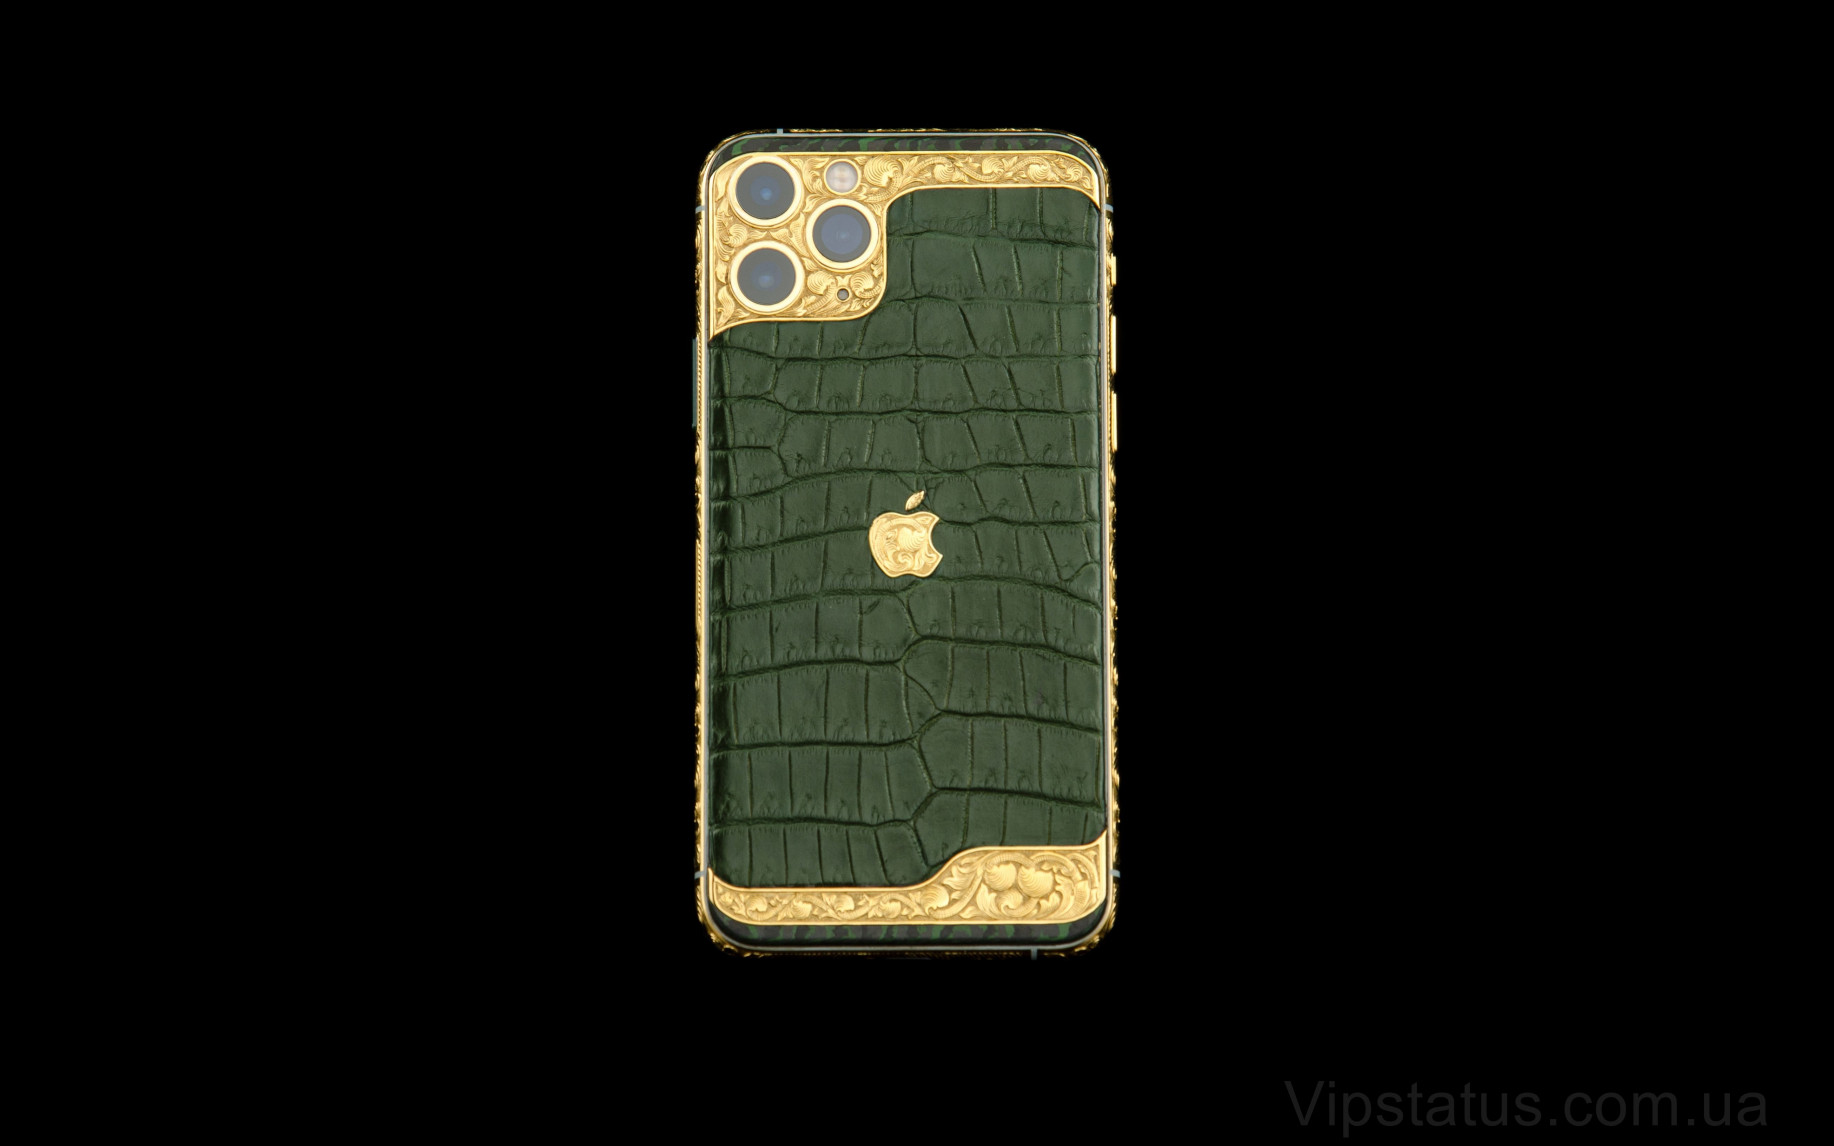 Elite Eastern Emerald IPHONE 11 PRO 512 GB Eastern Emerald IPHONE 11 PRO 512 GB image 4